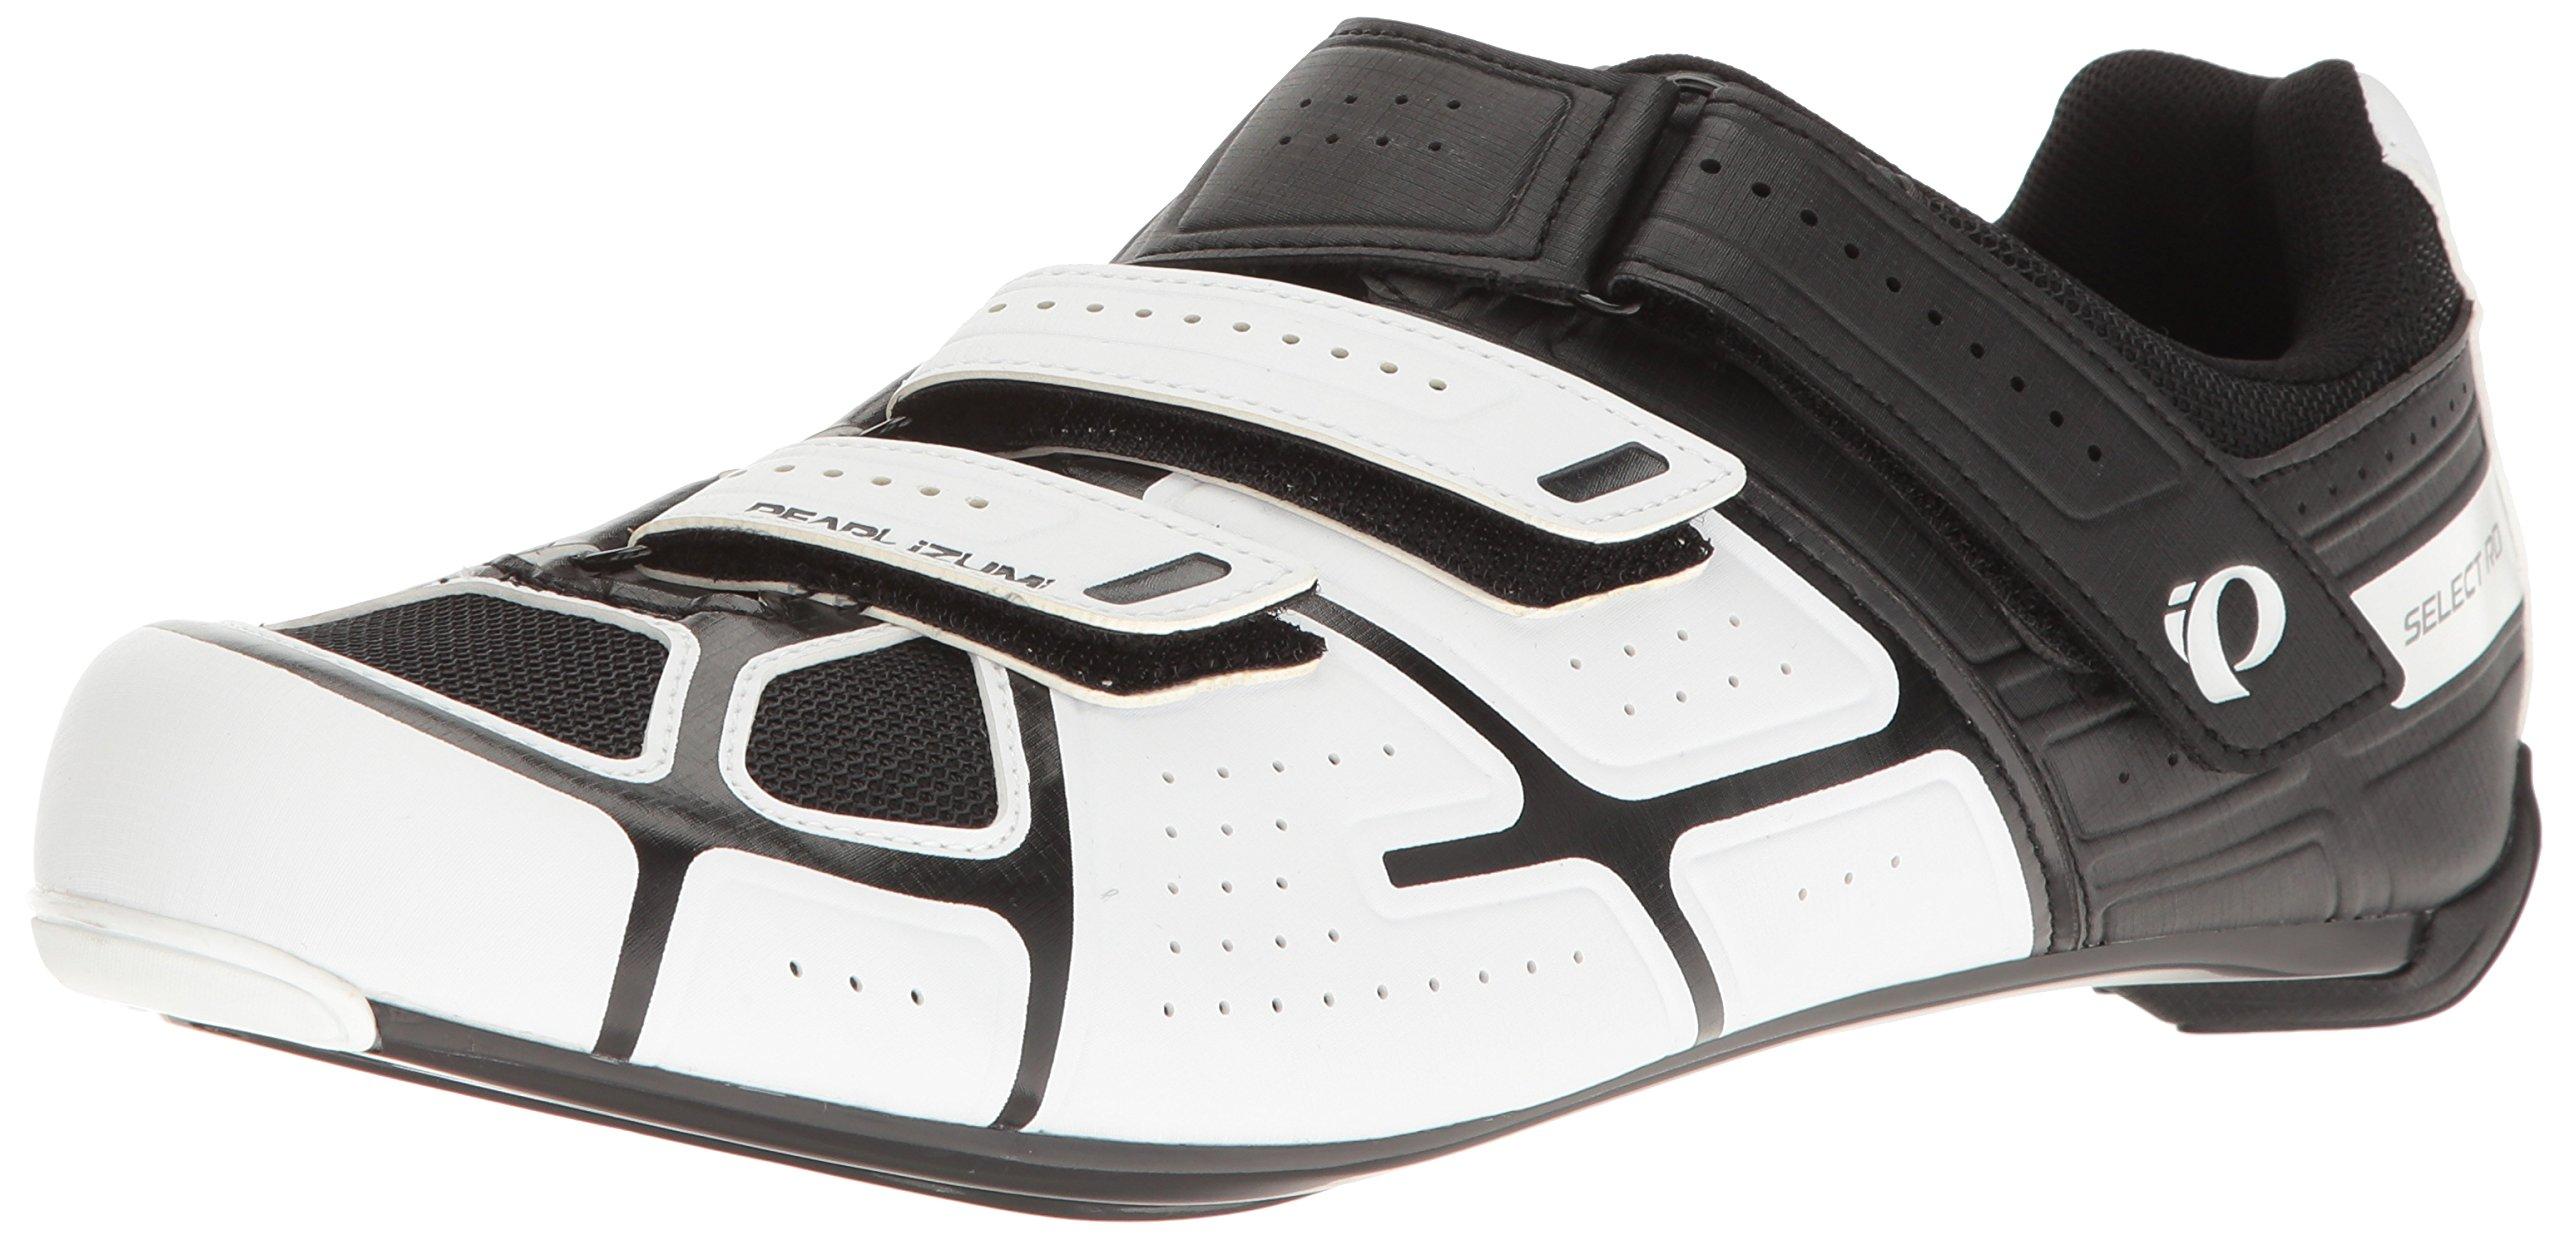 Pearl iZUMi Men's Select RD IV Cycling Shoe, White/Black, 51.0 EU/15.5 M US